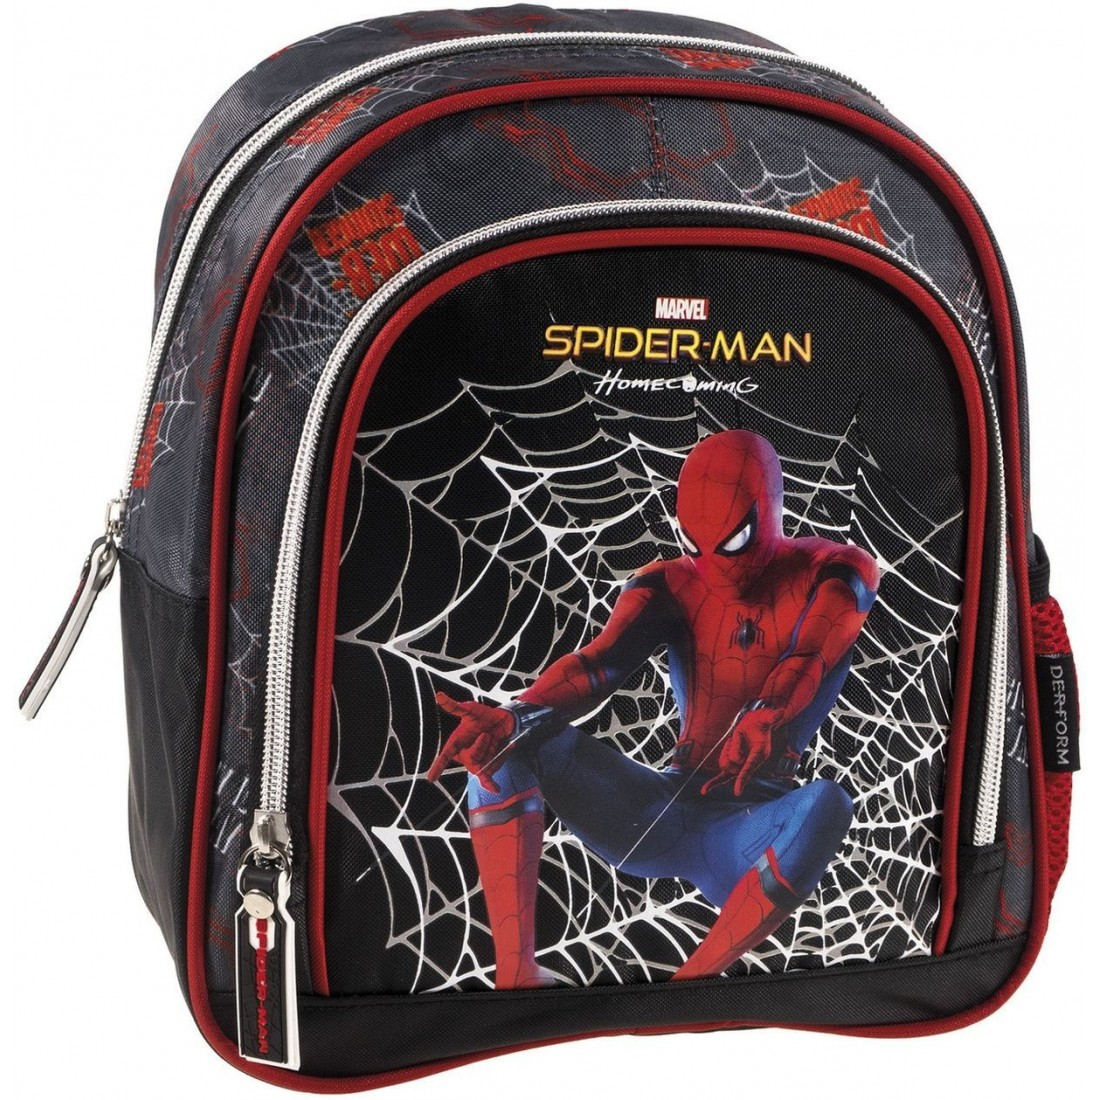 343f18fcf1a63 Mały plecak SPIDERMAN dla chłopca czarny - plecak-tornister.pl